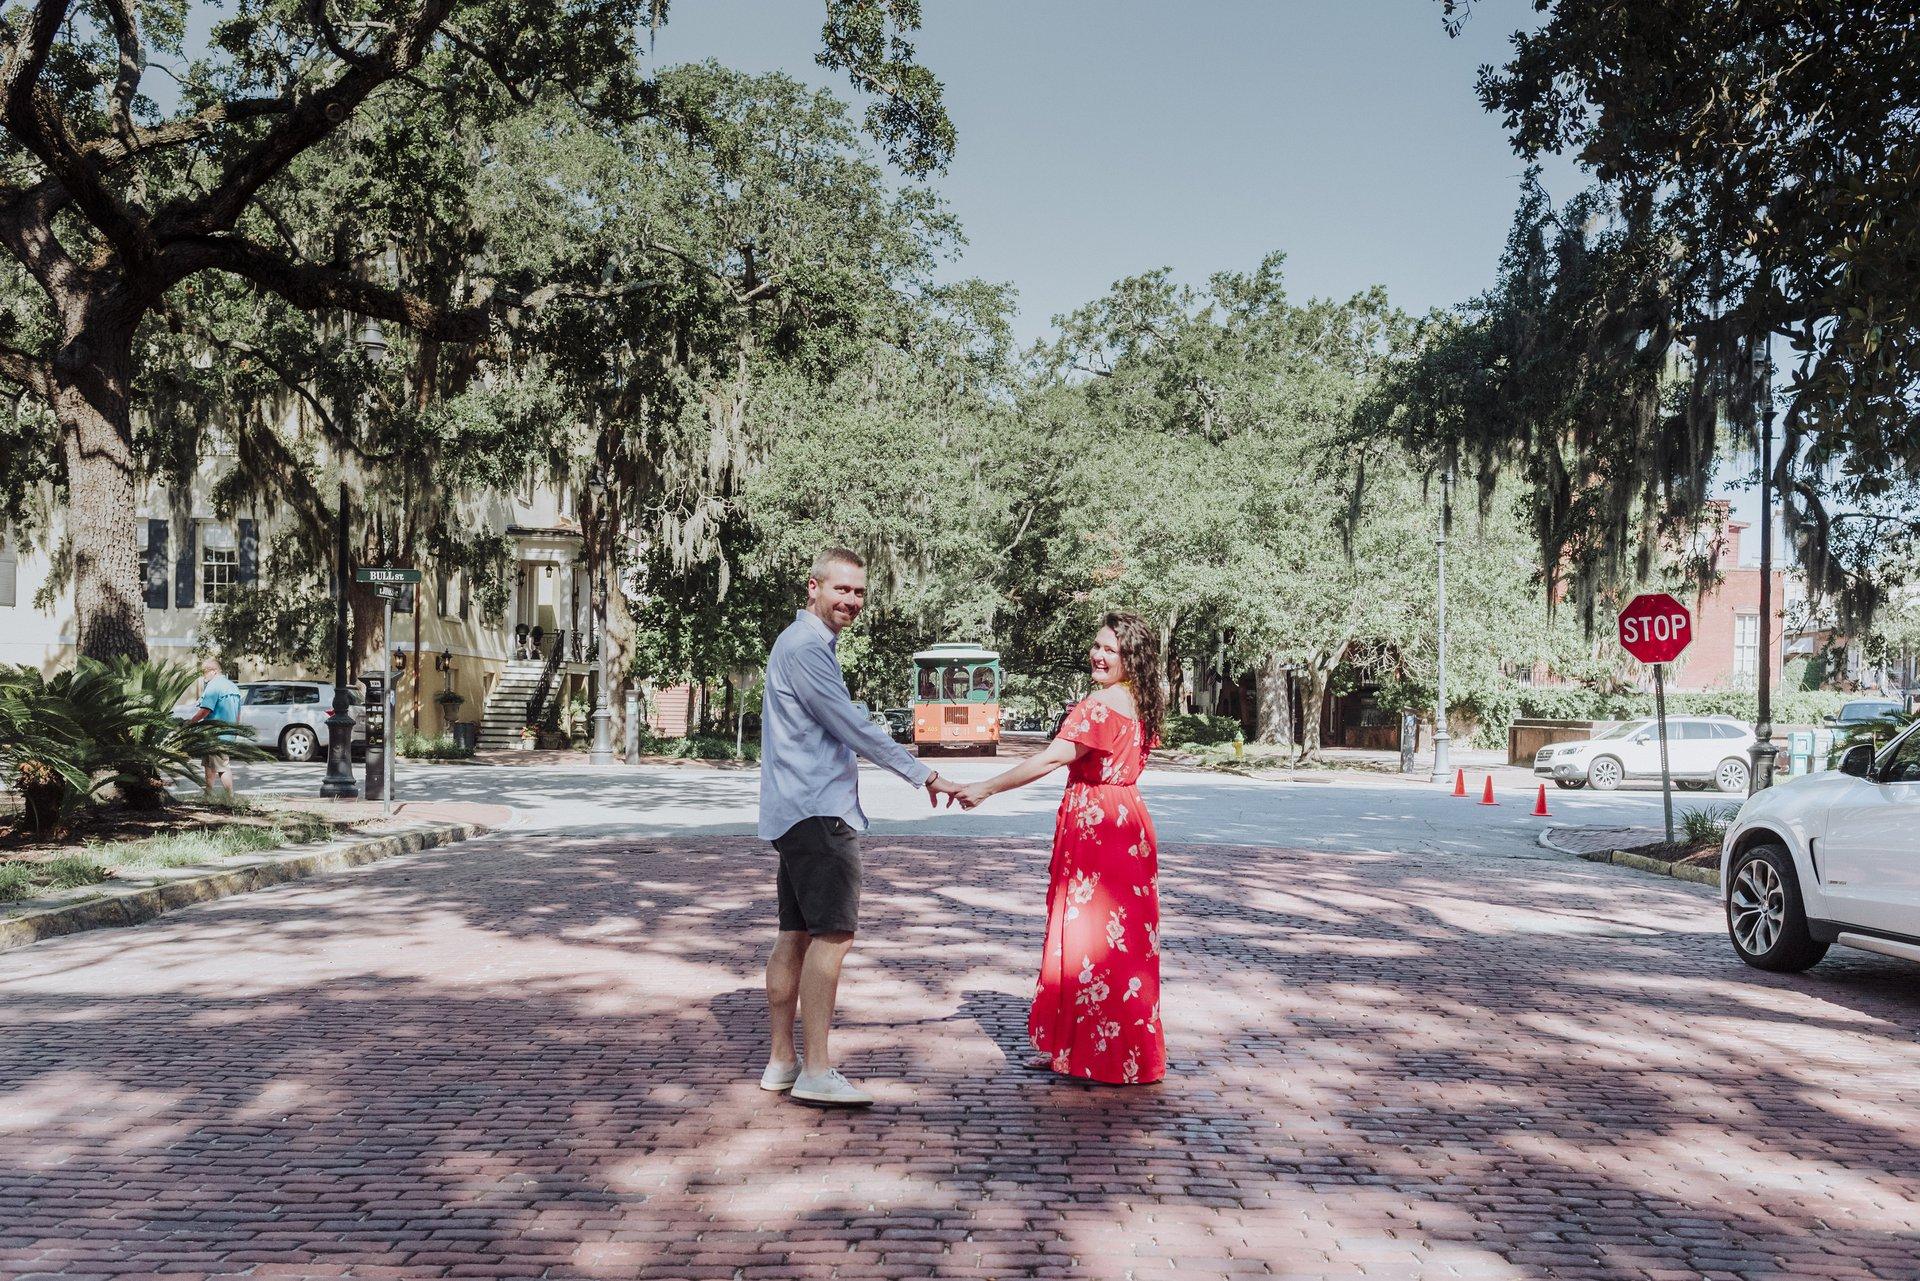 Savannah-United States-travel-story-Flytographer-33